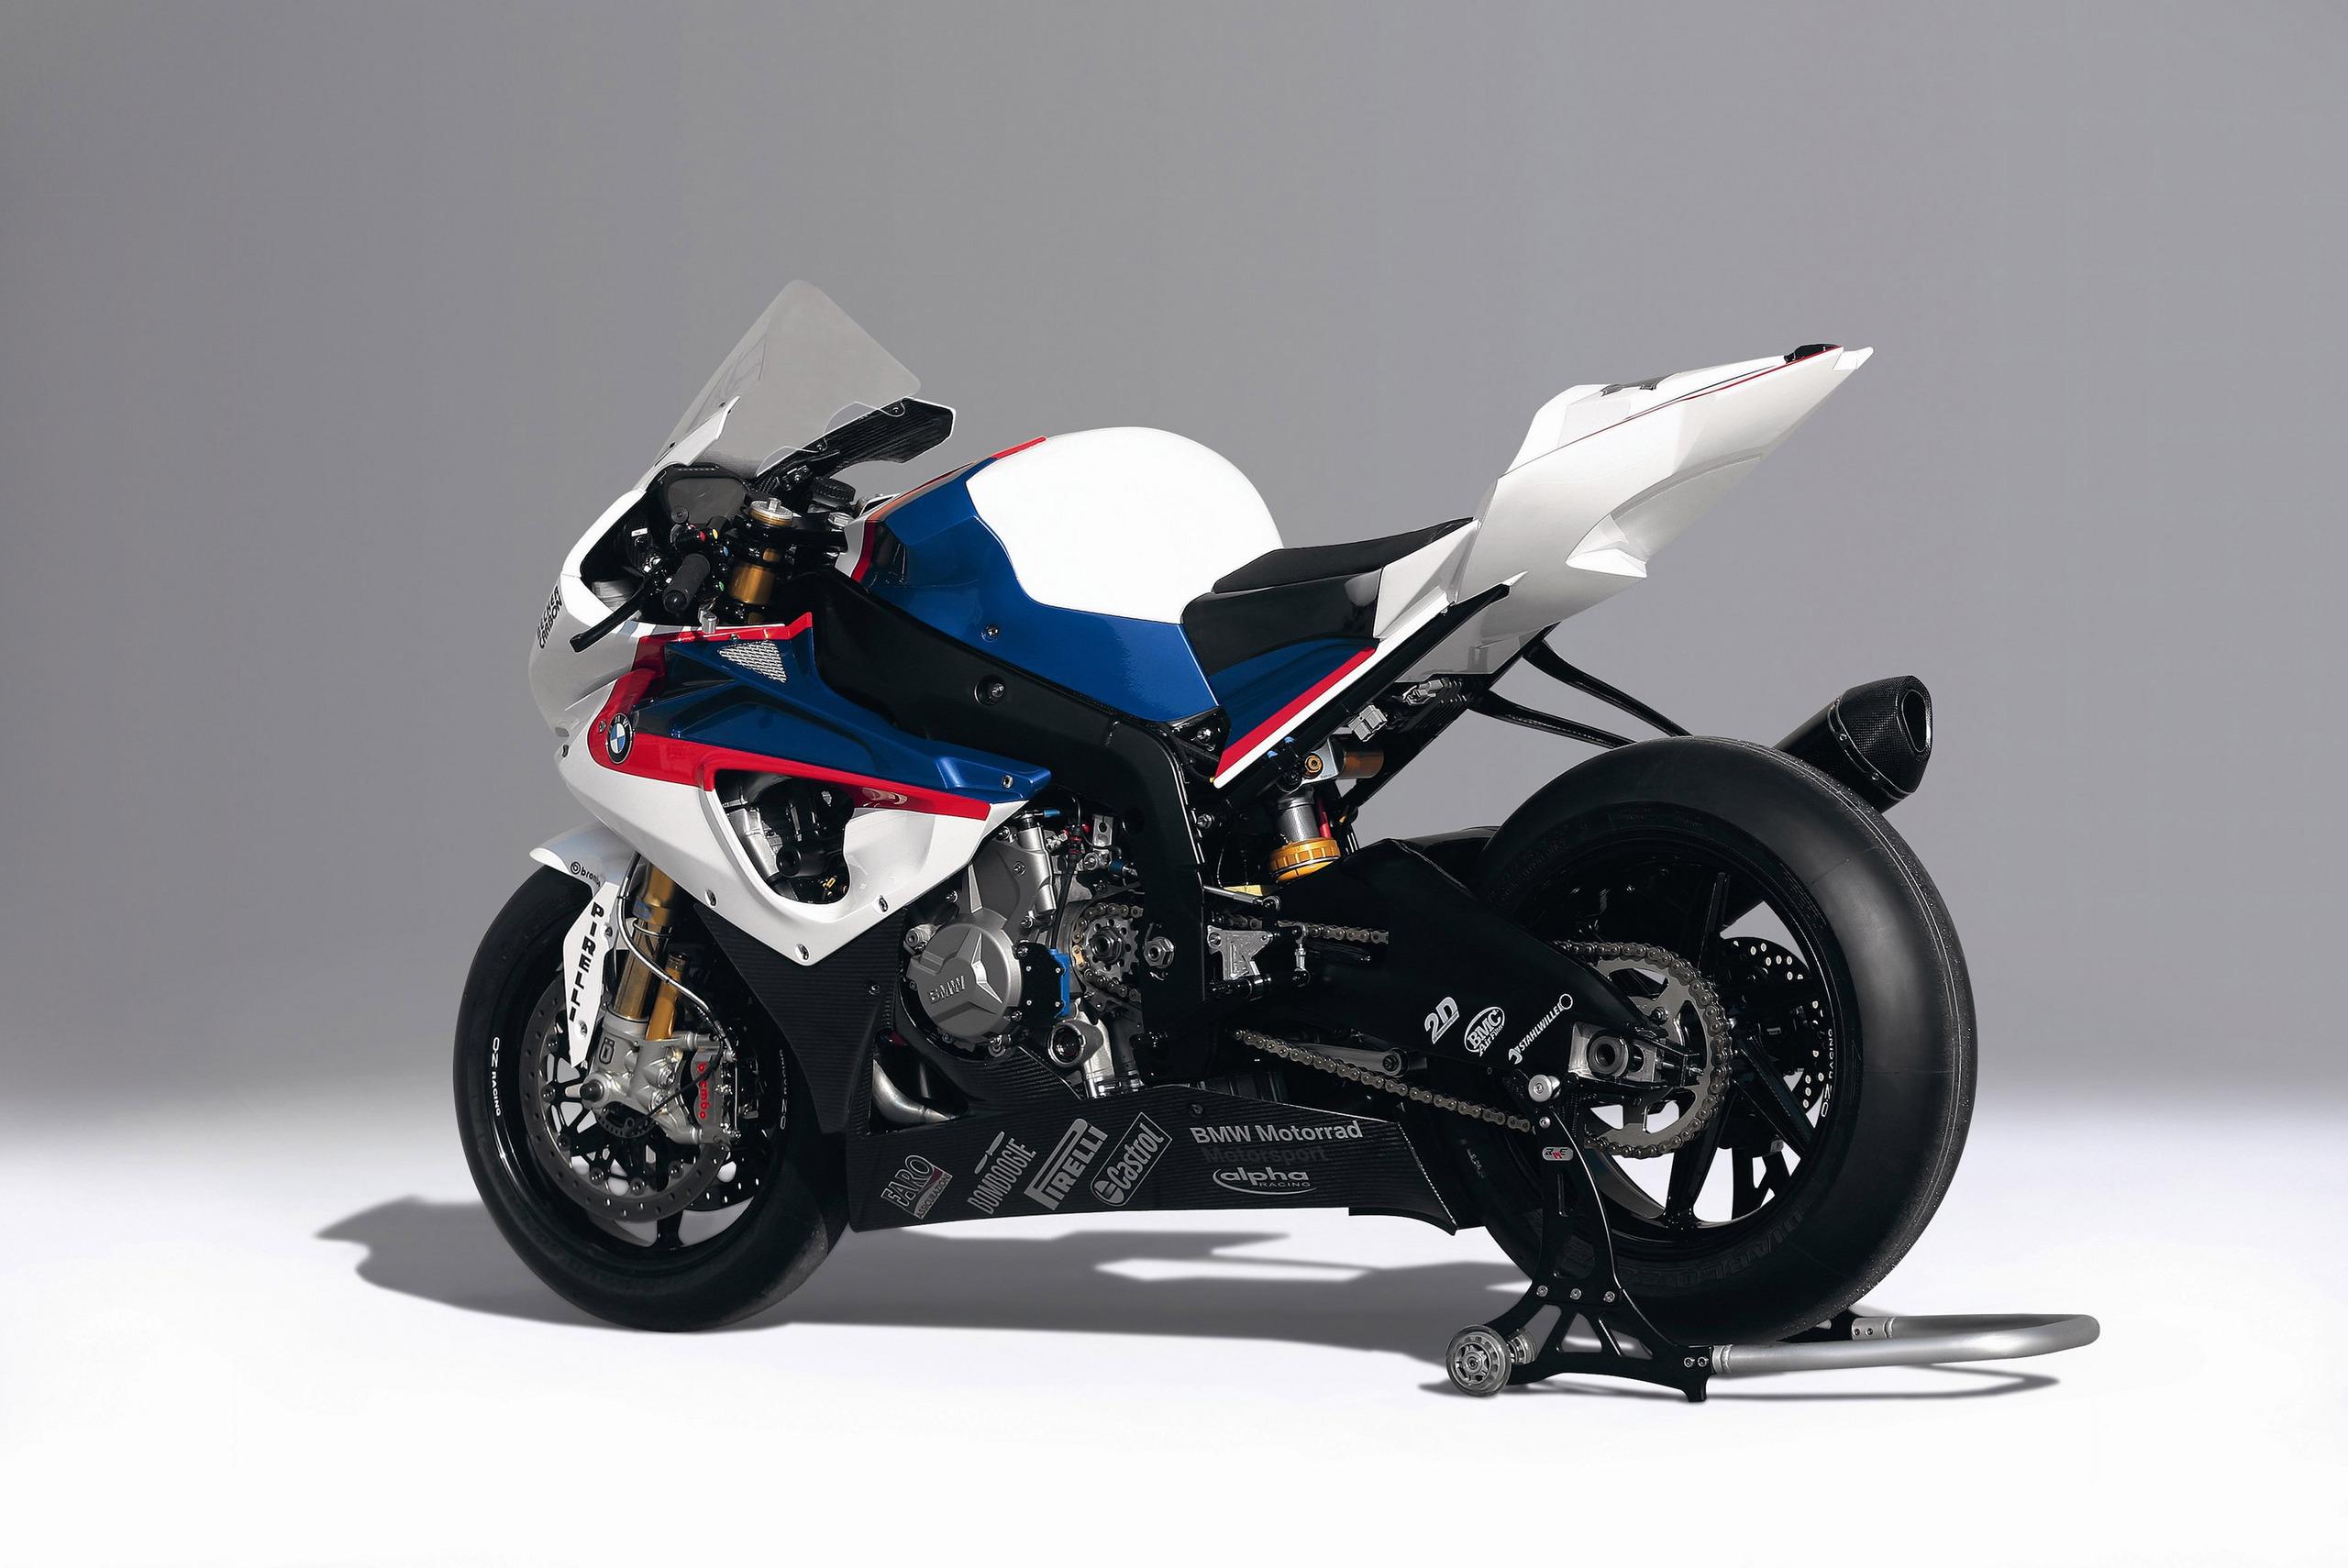 Bmw S 1000 Rr Sbk Motorcycles Photo 24459034 Fanpop